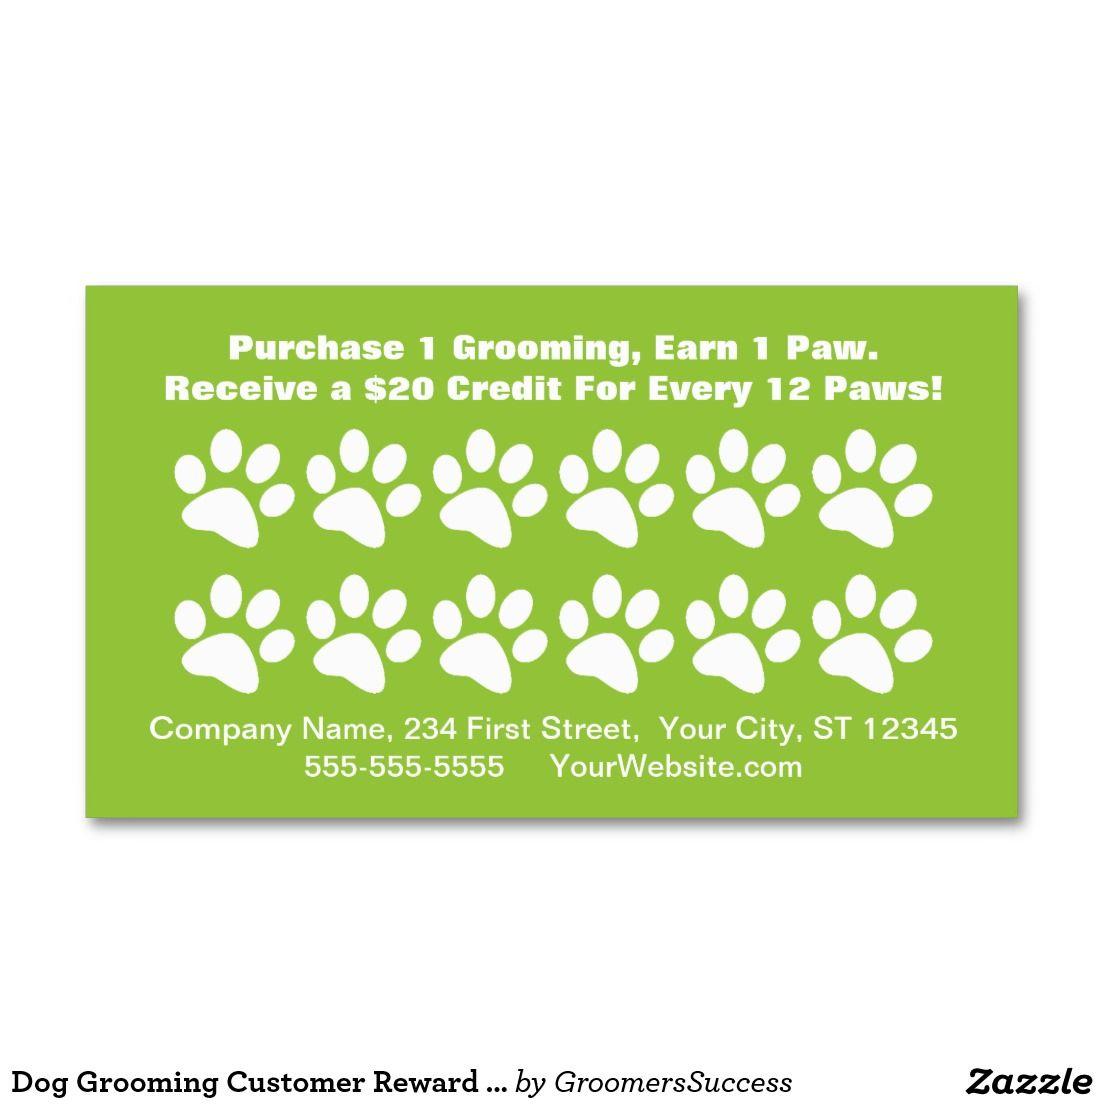 Dog Grooming Customer Reward Card - Loyalty Card | Loyalty, Dogs and ...